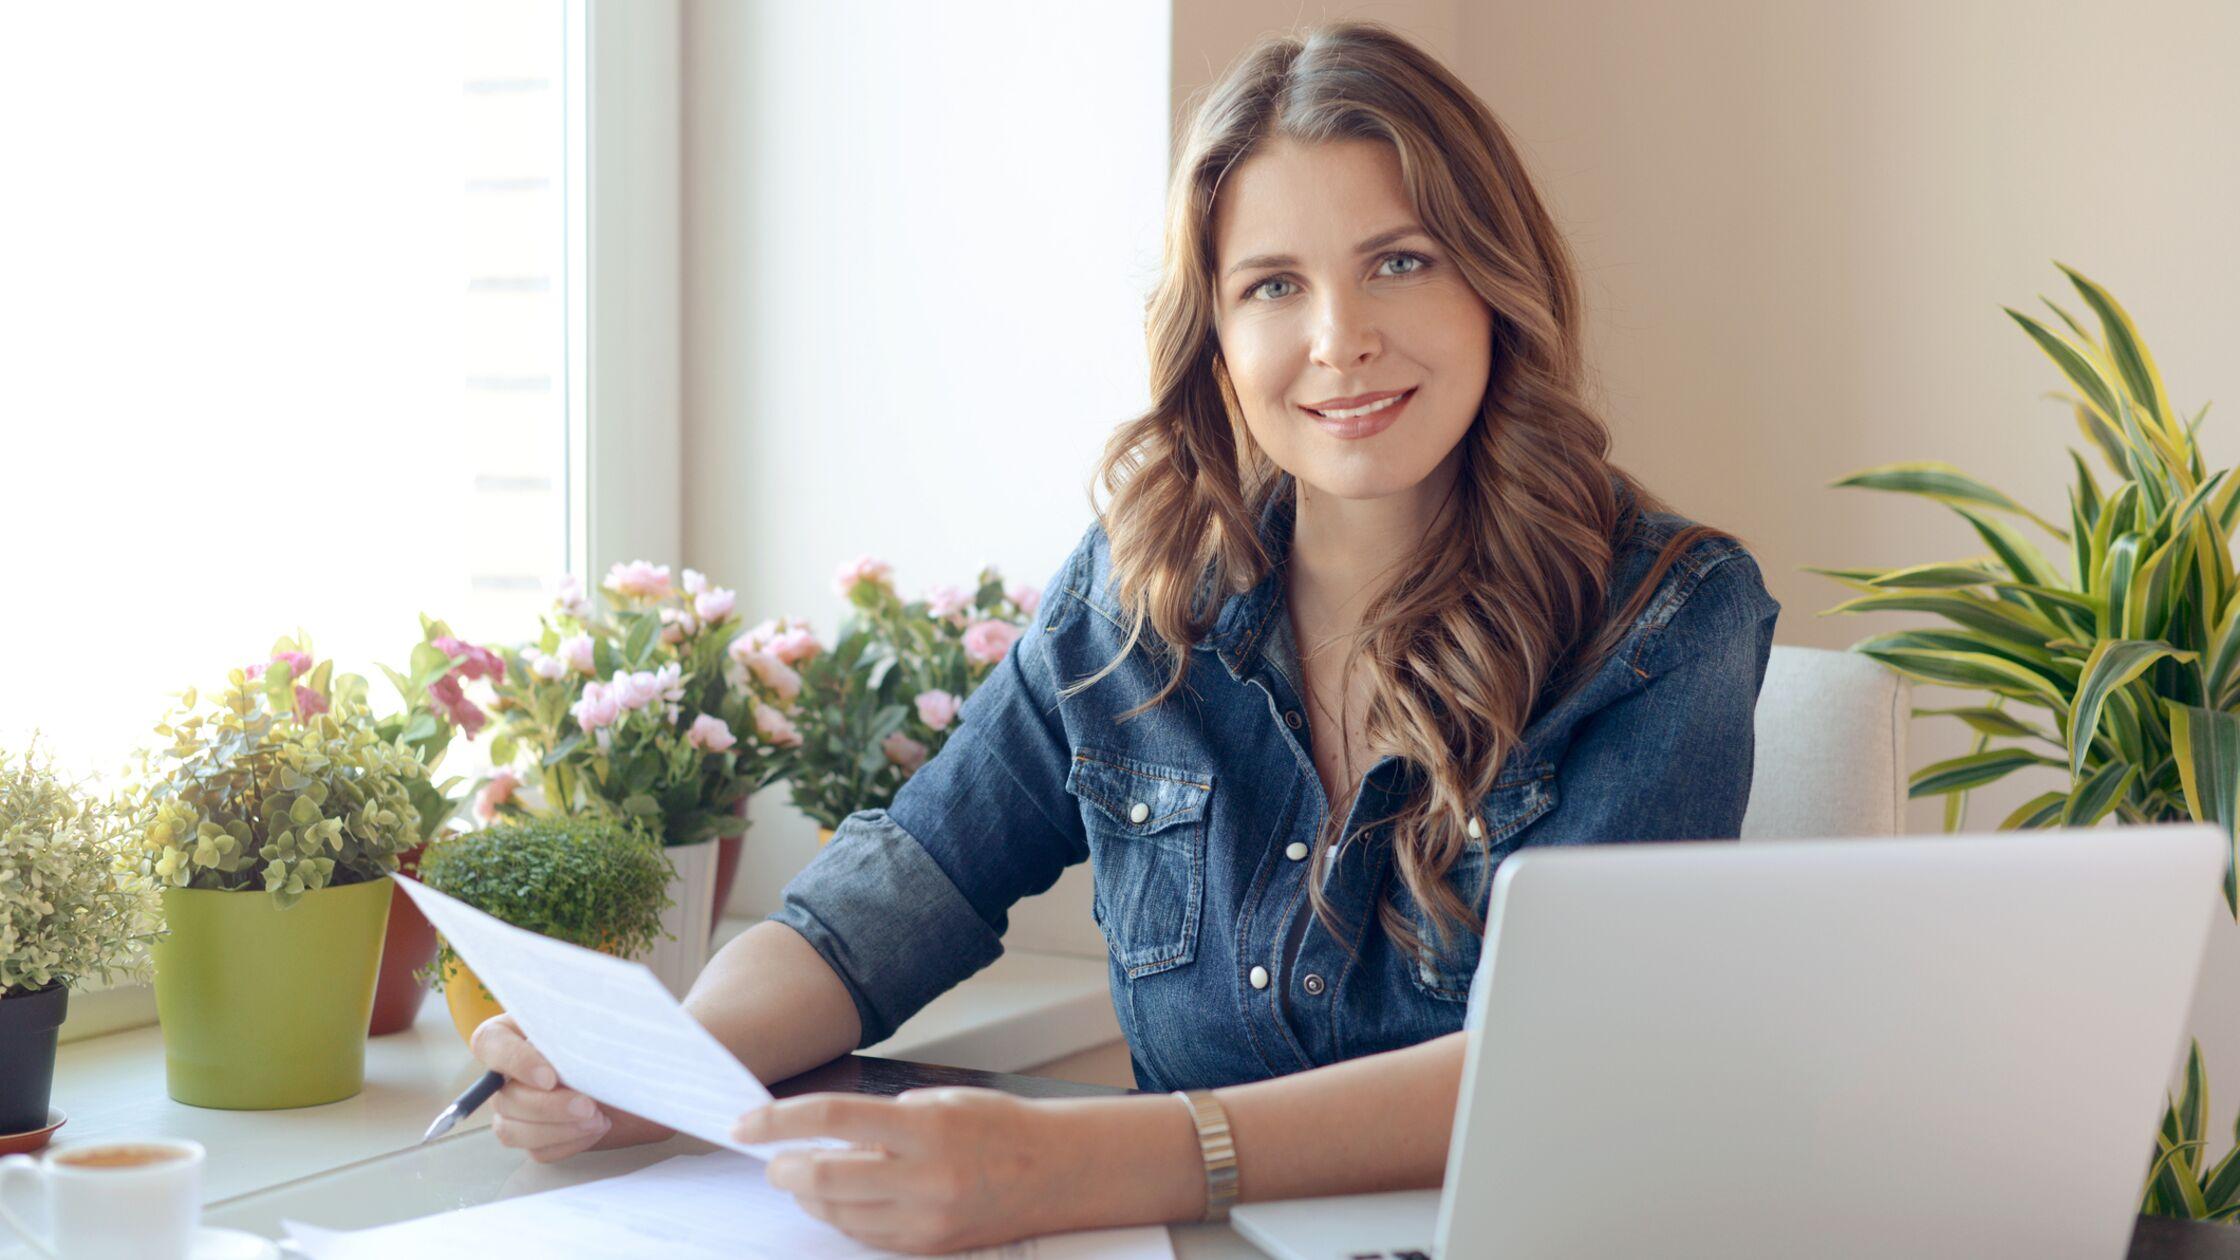 Frau füllt Formular am Schreibtisch aus